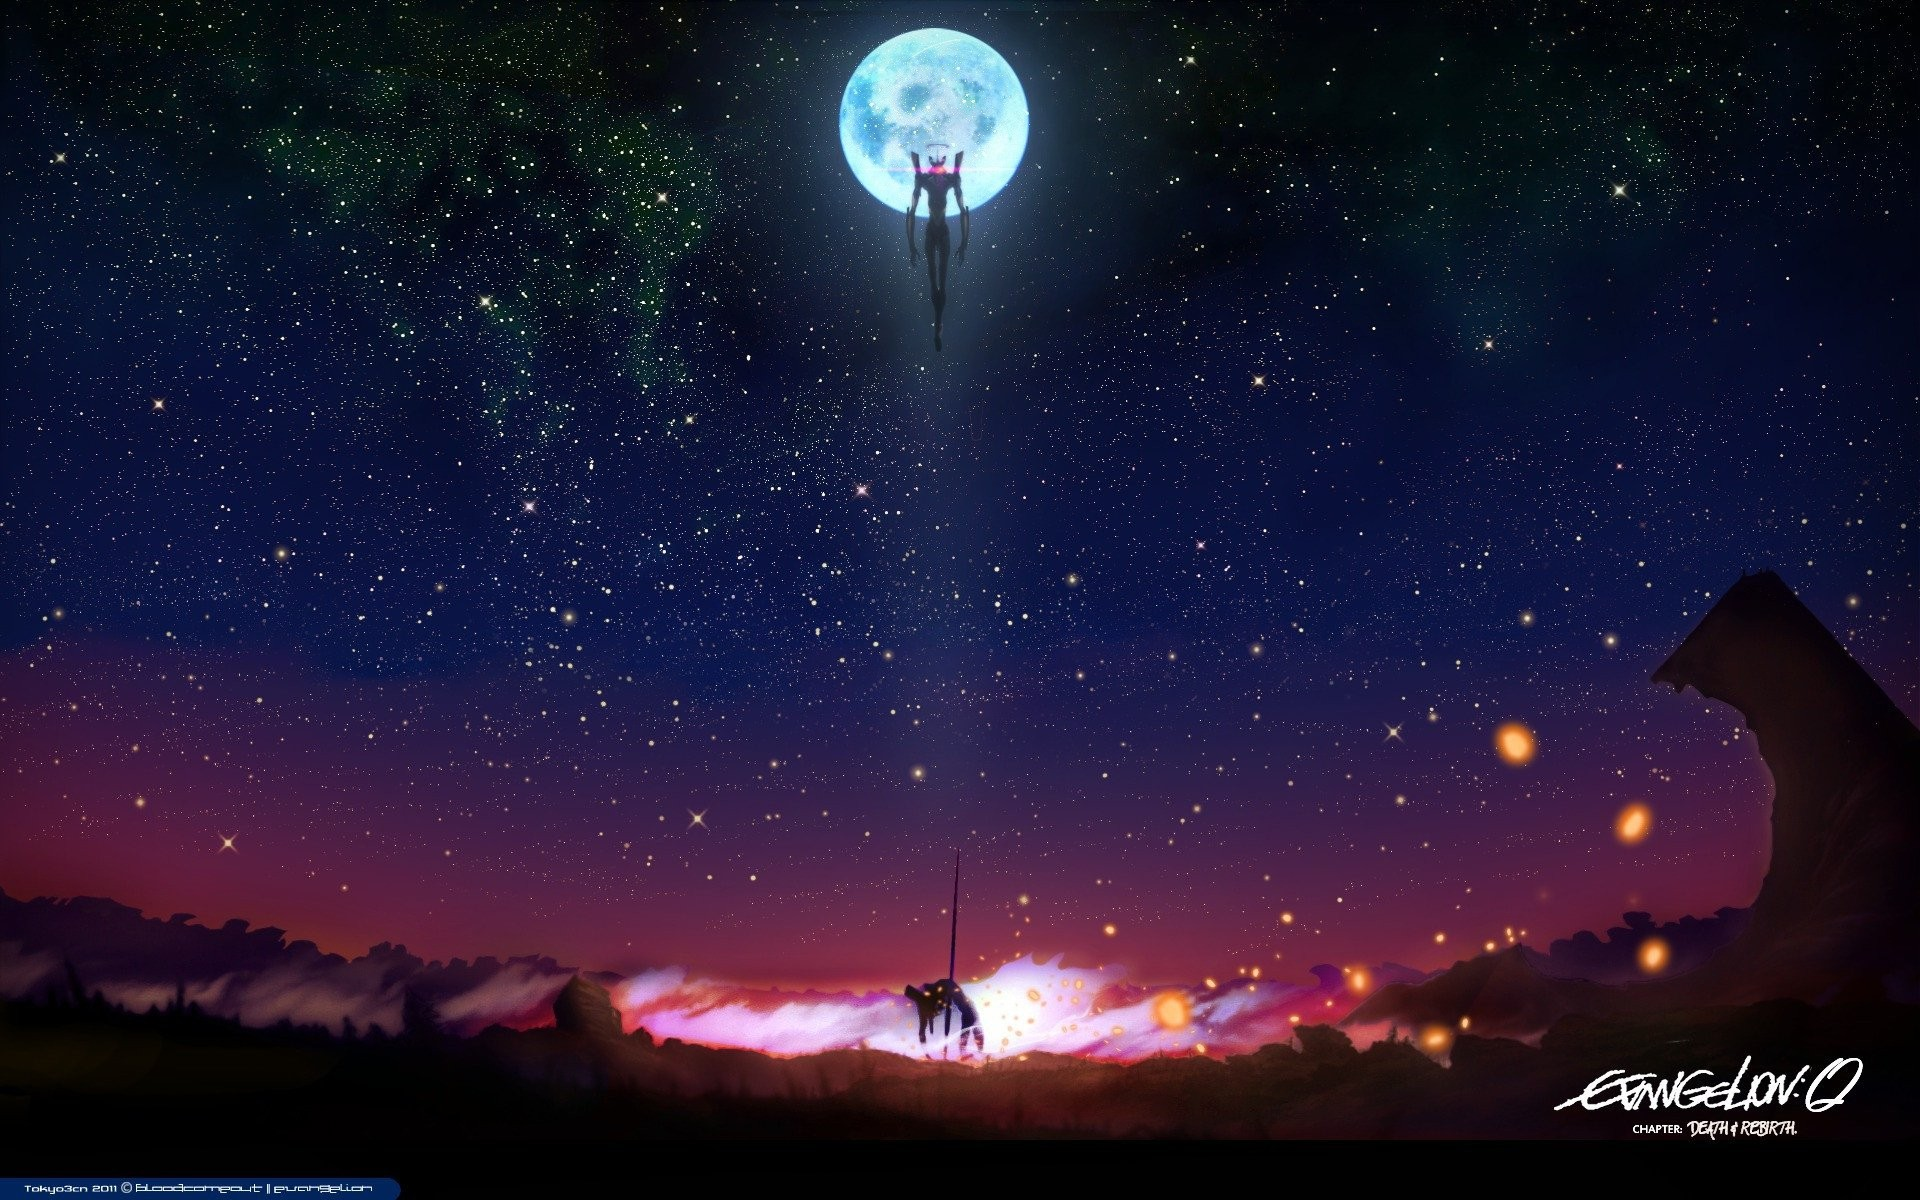 Neon Genesis Evangelion Wallpaper 1 Download Free Full HD